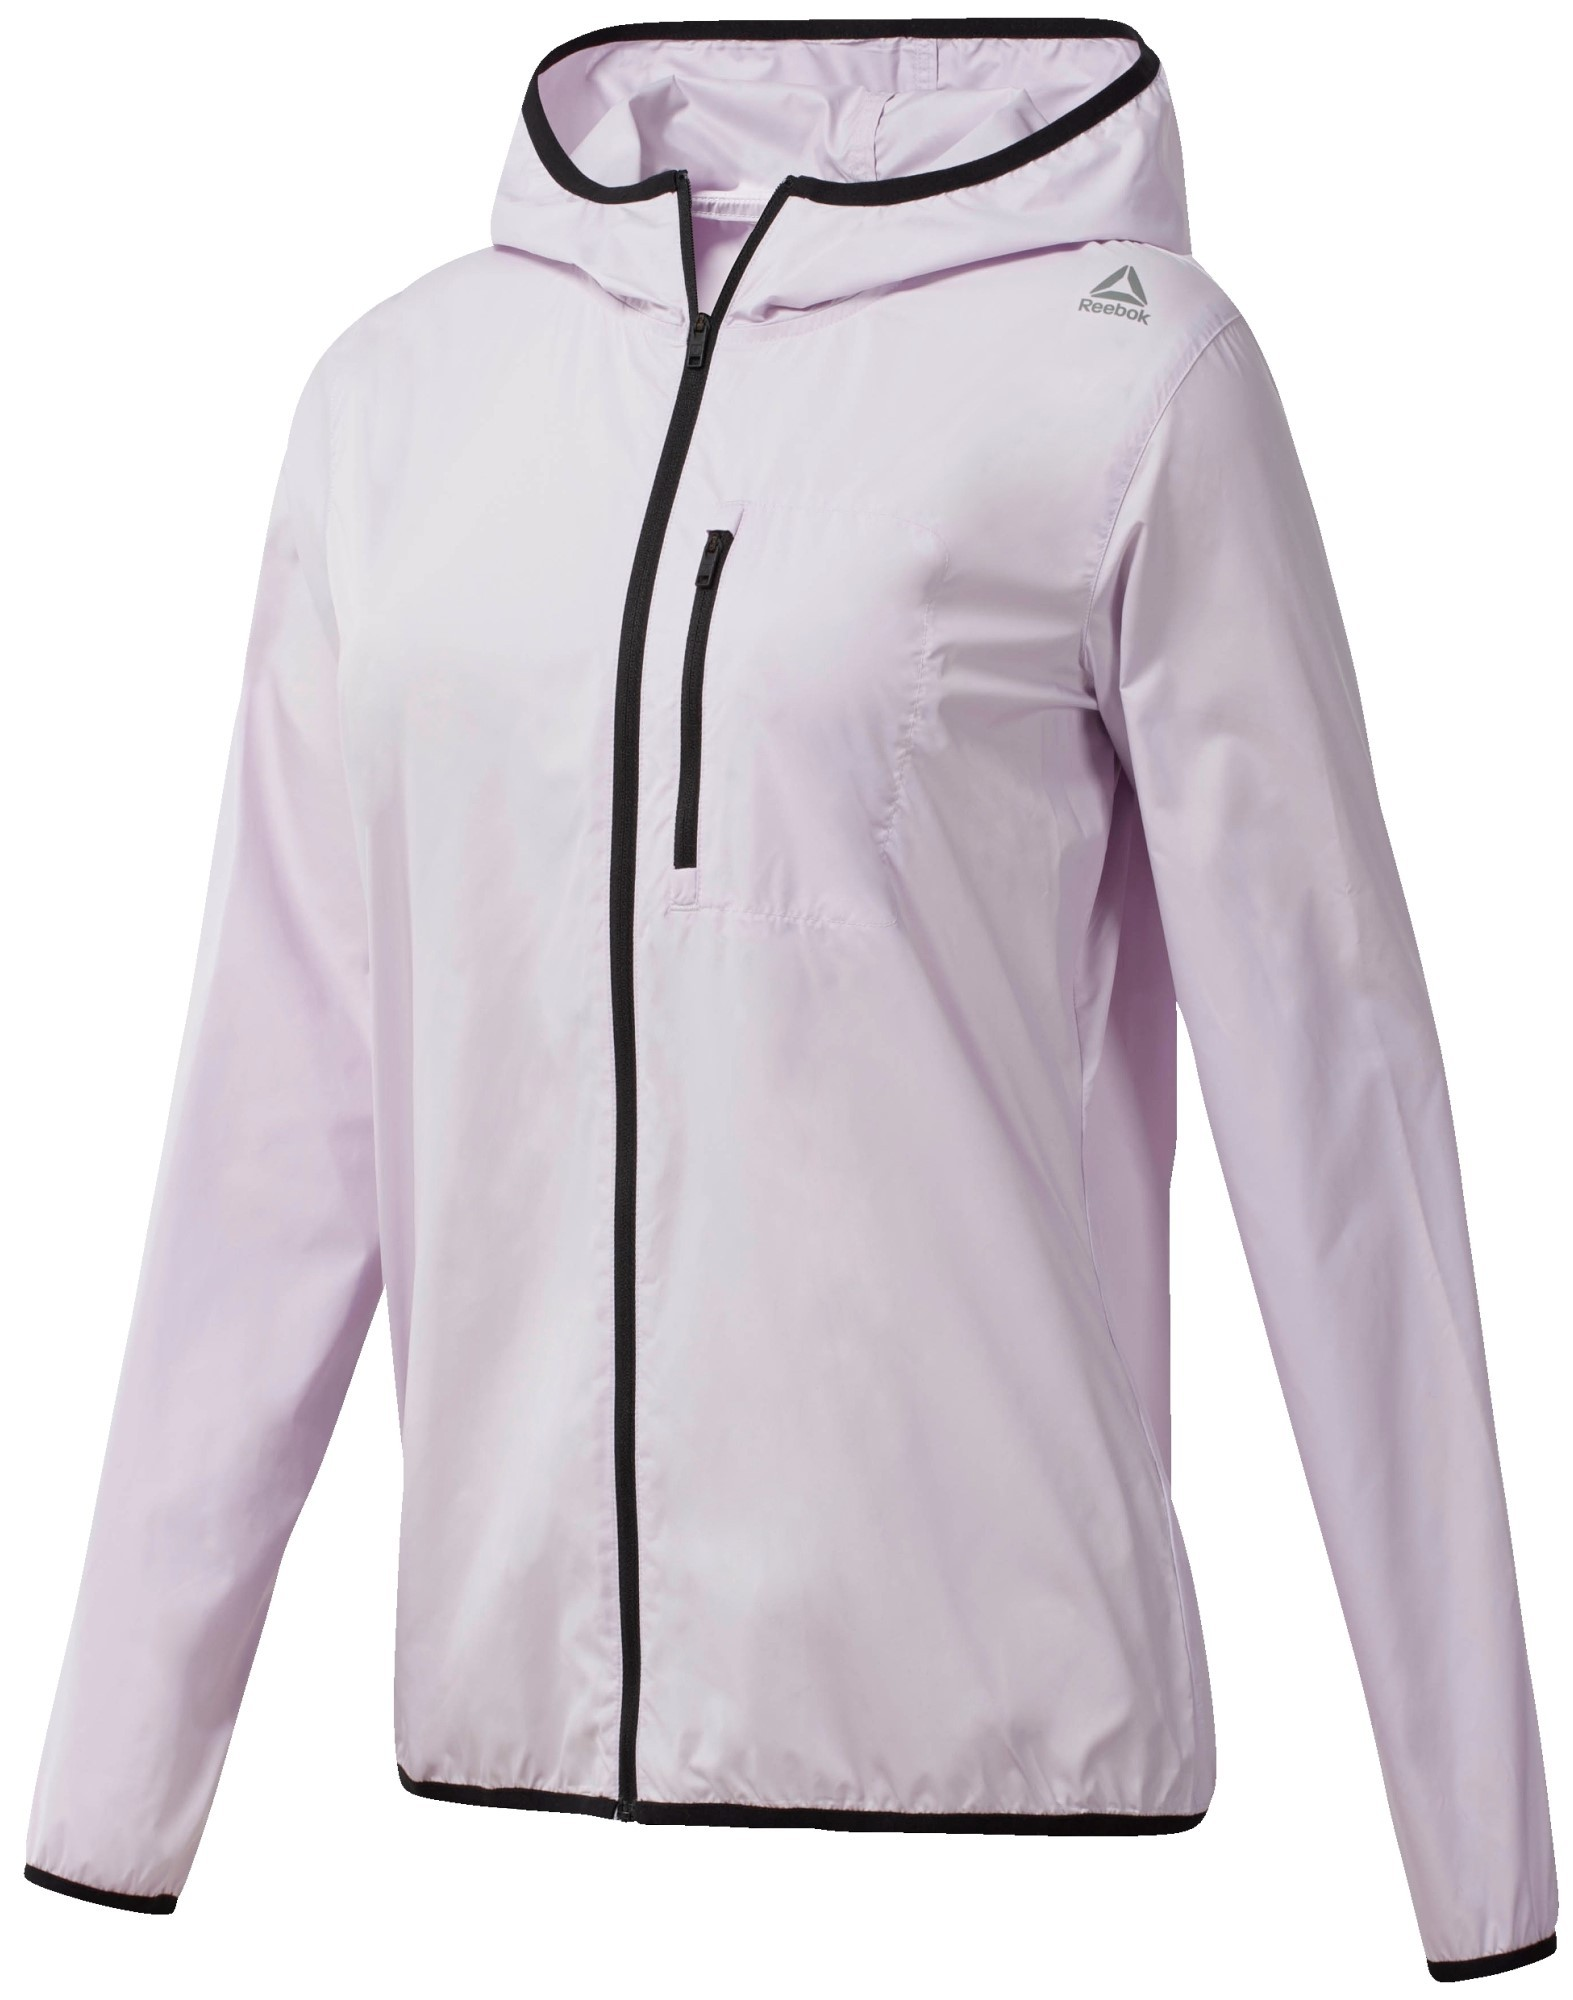 Ветровка женская Reebok Wor Wvn Jacket, цвет: белый. CE1193. Размер M (46/48)